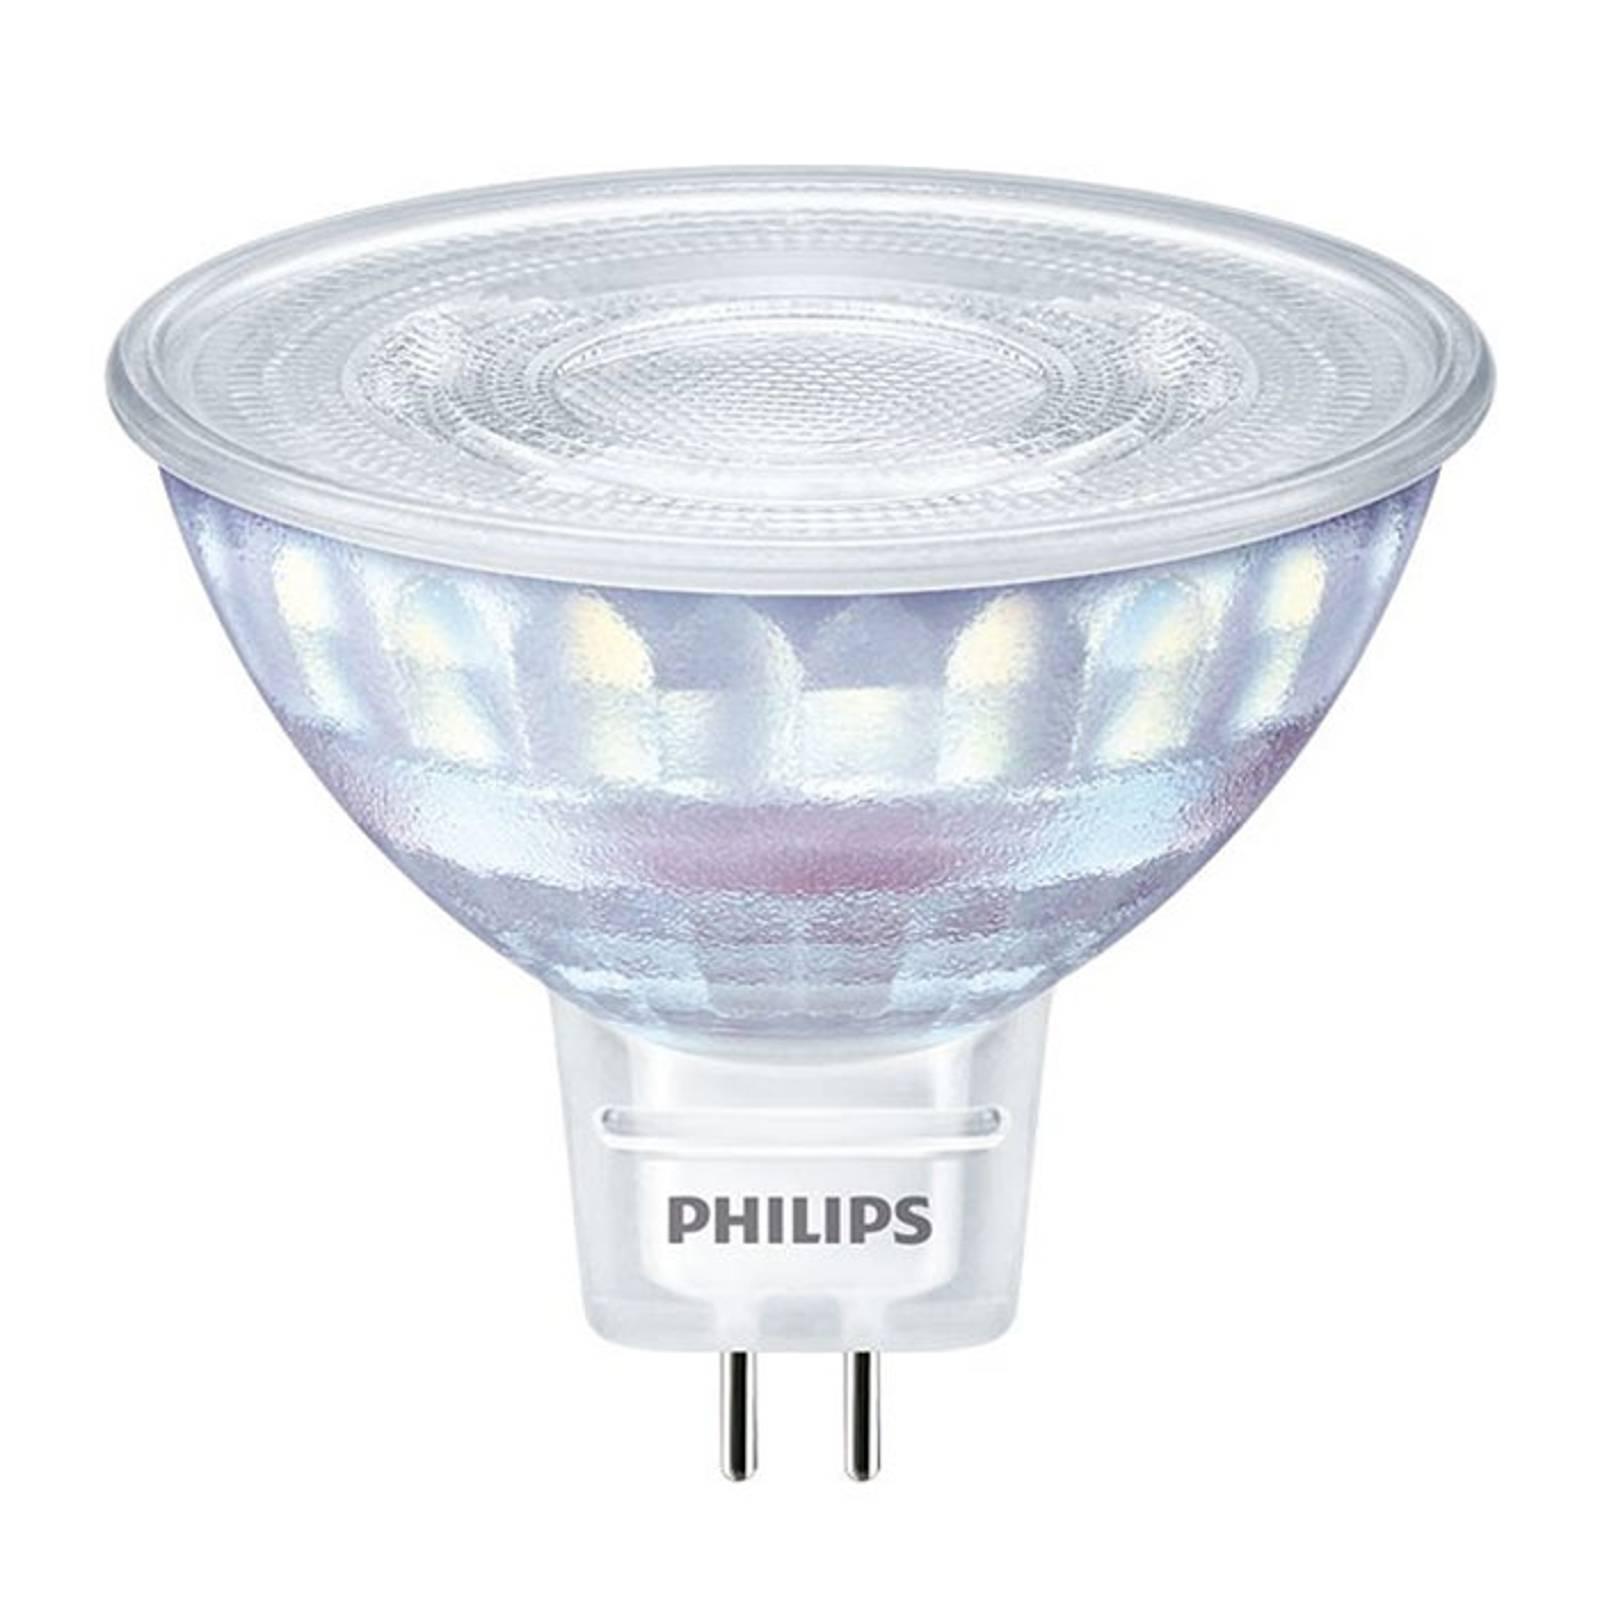 Philips LED riflettore GU5,3 7W dimming warmglow